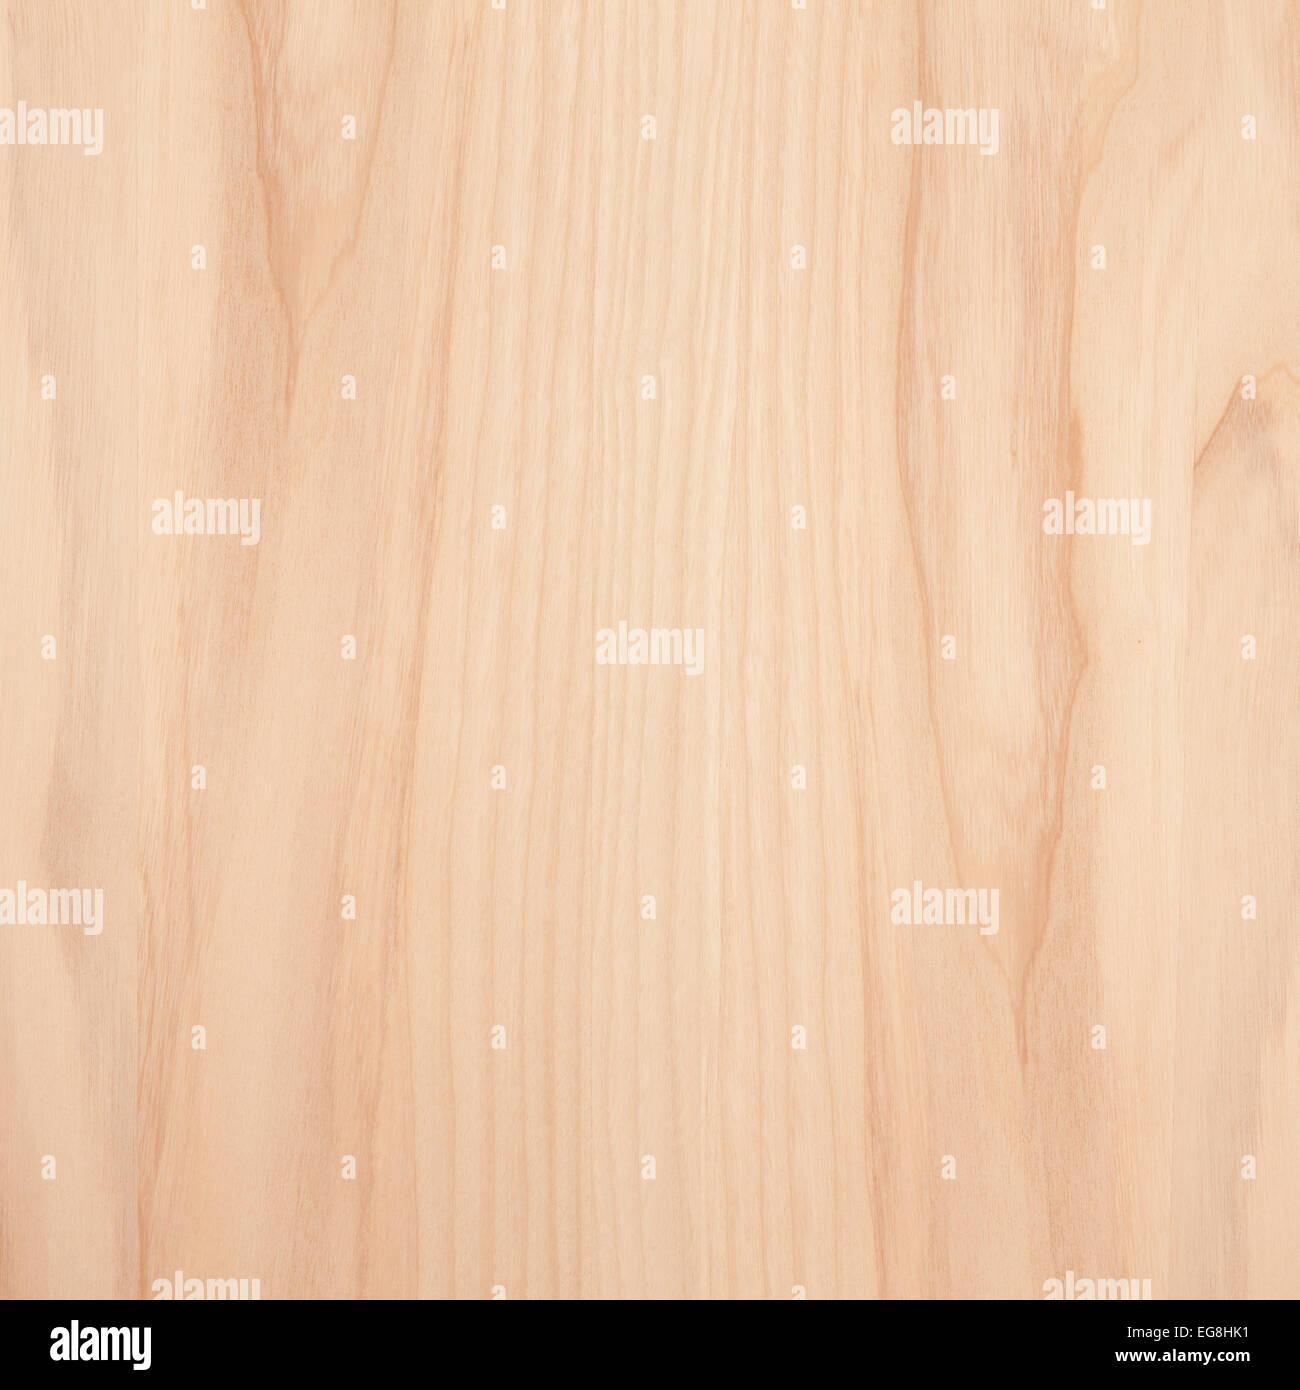 Plancha de madera cruda de fondo o la textura de la madera Imagen De Stock